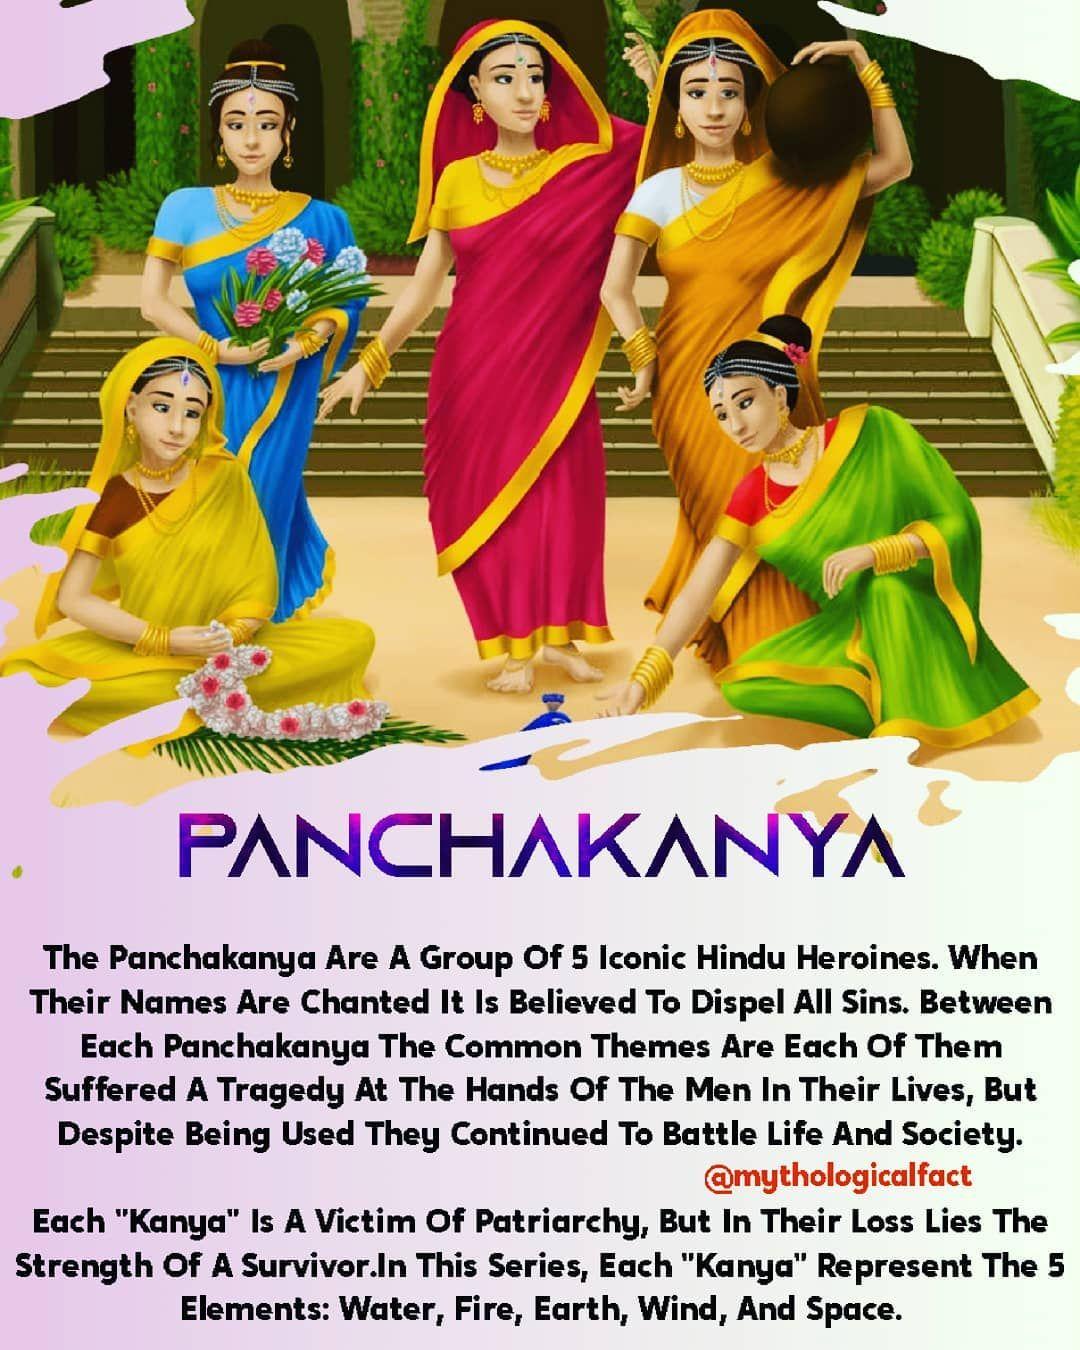 The Panchakanya(पञ्चकन्या) Are A Group Of Five